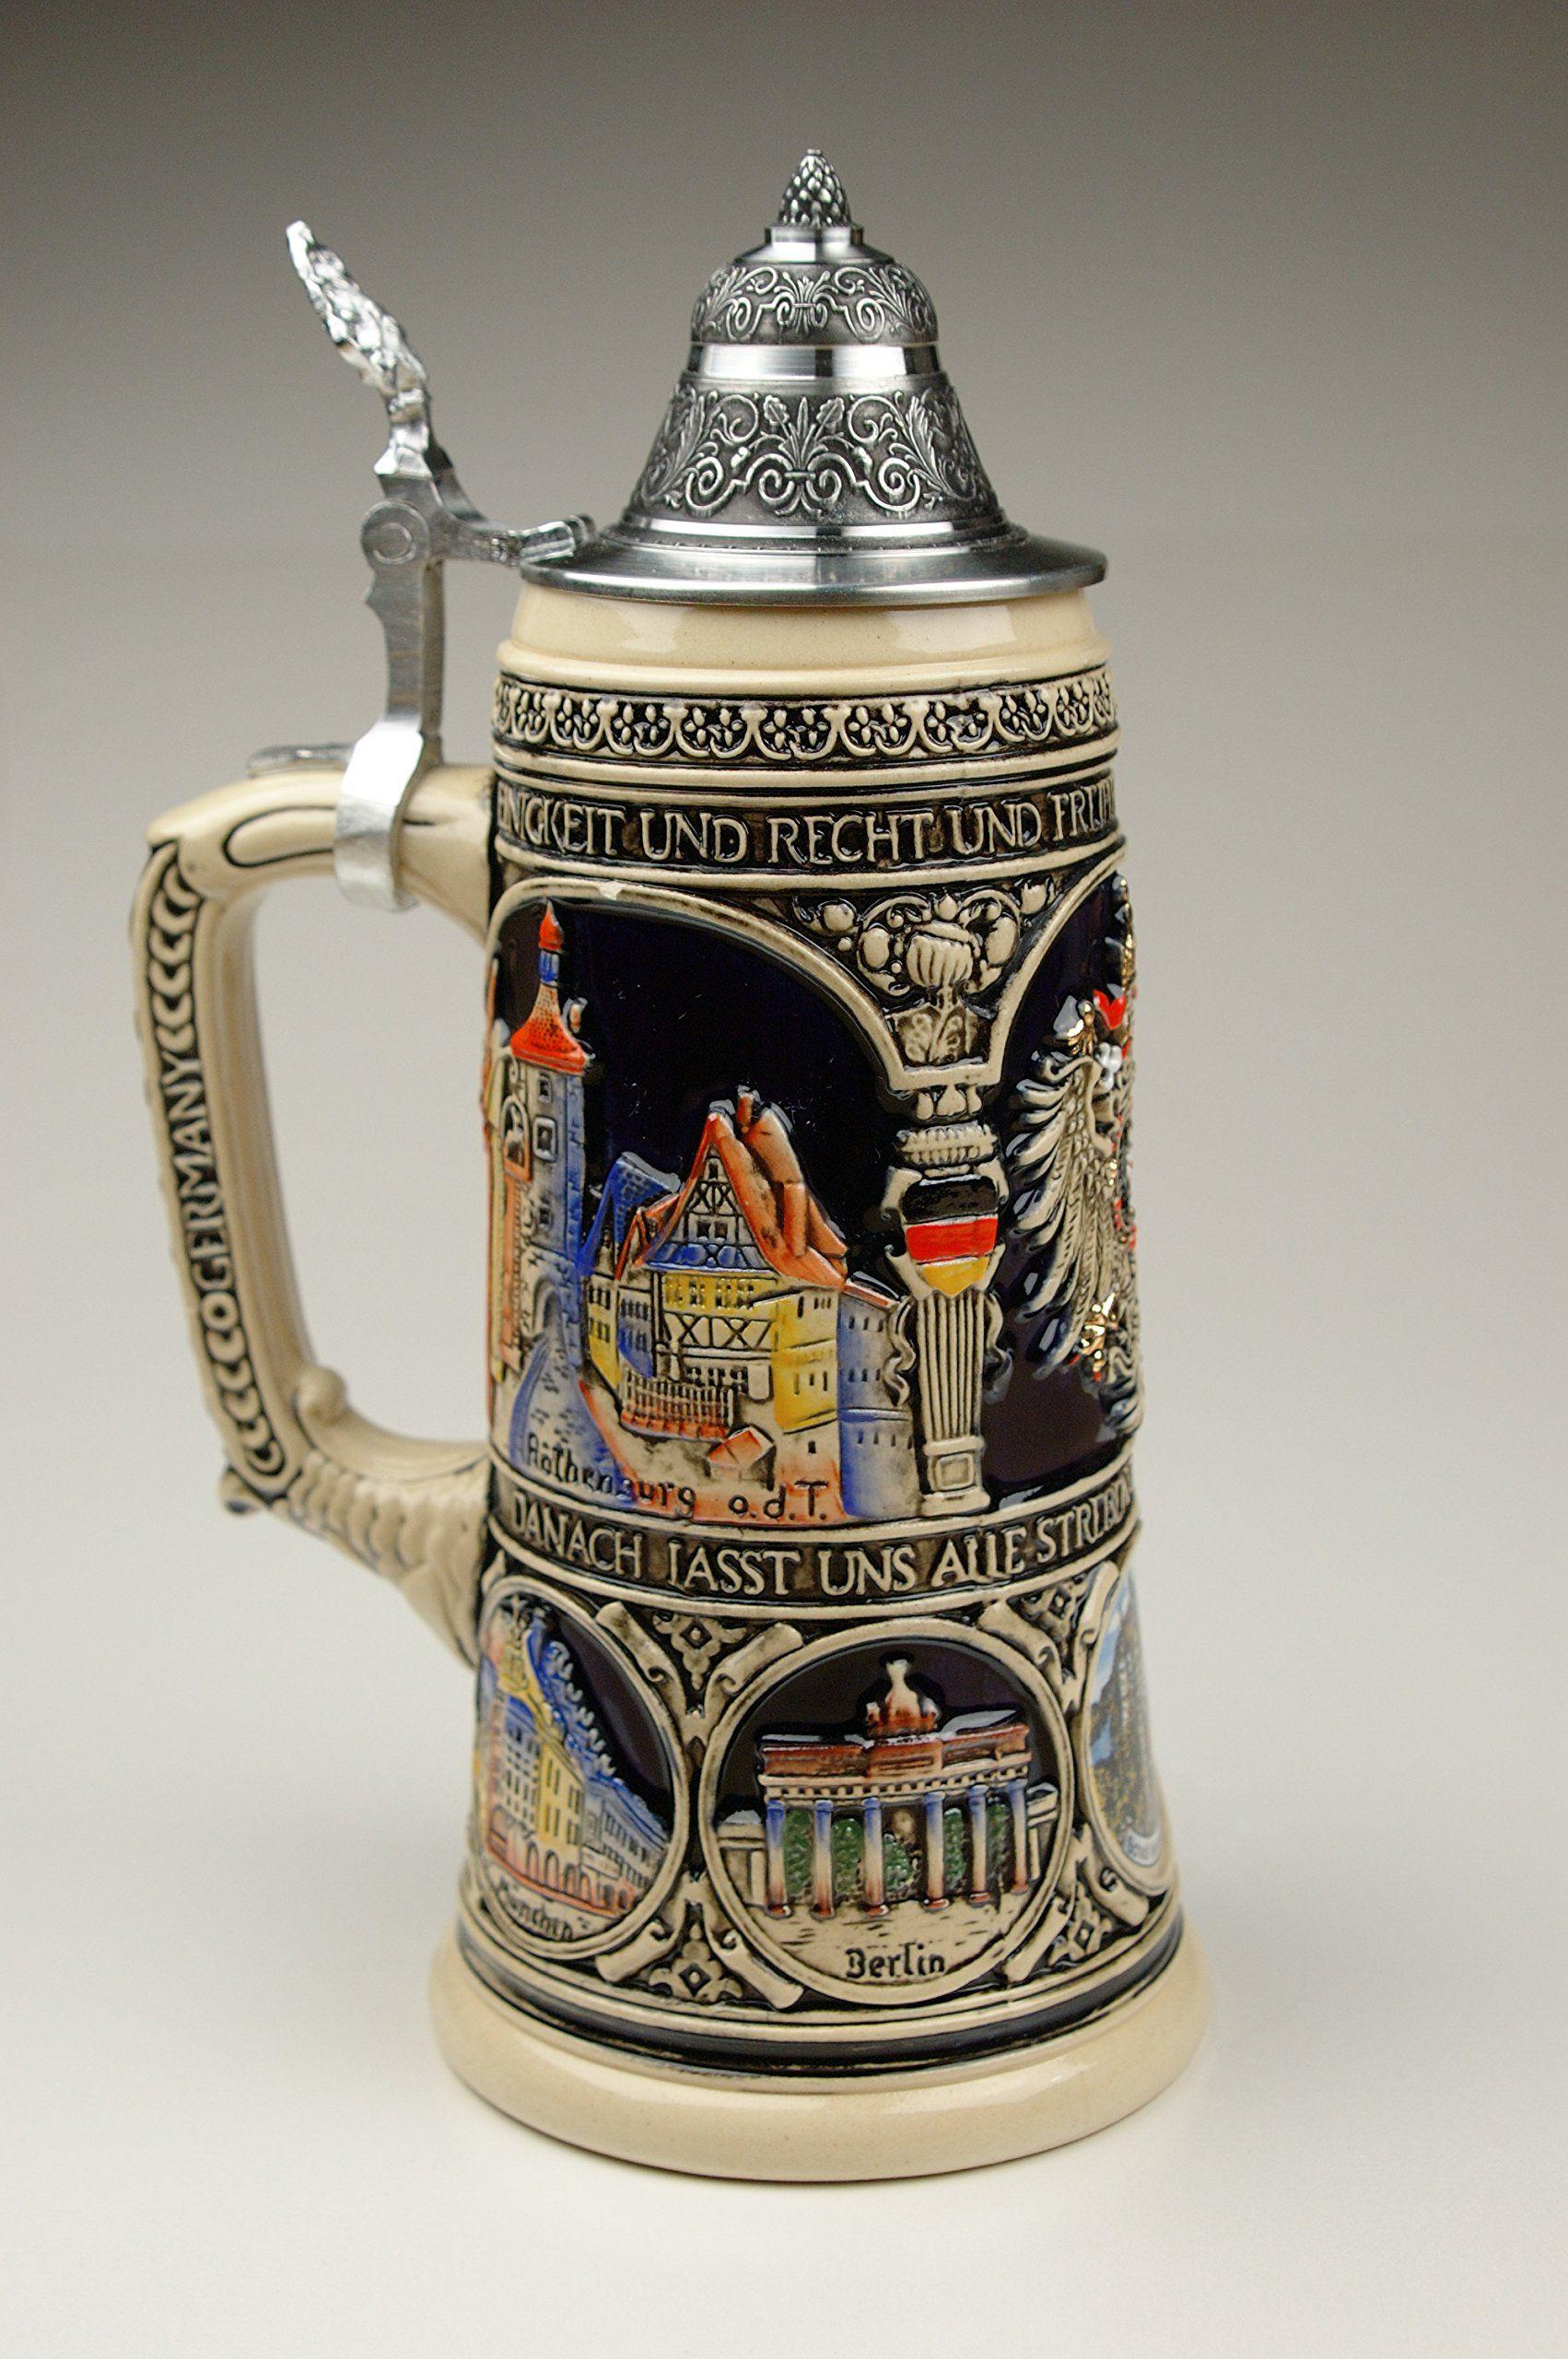 0.75l Limited Old Heritage CoA and Landmarks Relief Colored Beer Stein Beer Mug by King Beer Mug